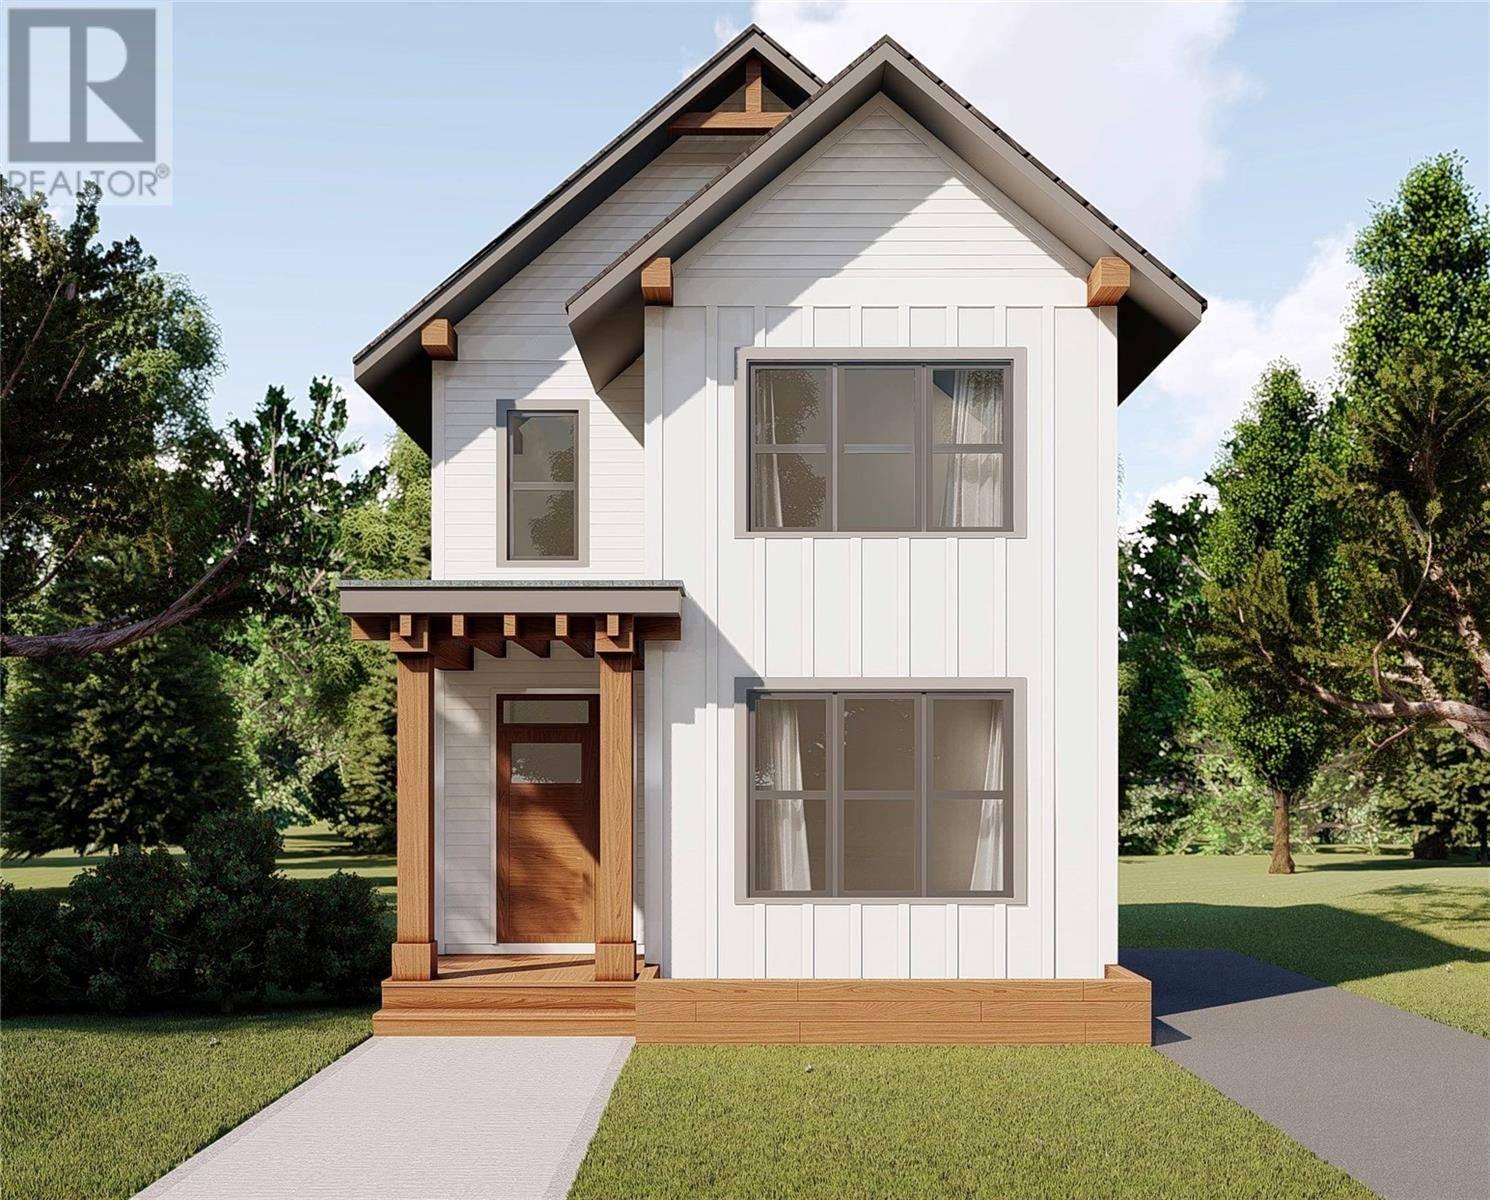 House for sale at 1310 15th St E Saskatoon Saskatchewan - MLS: SK789394